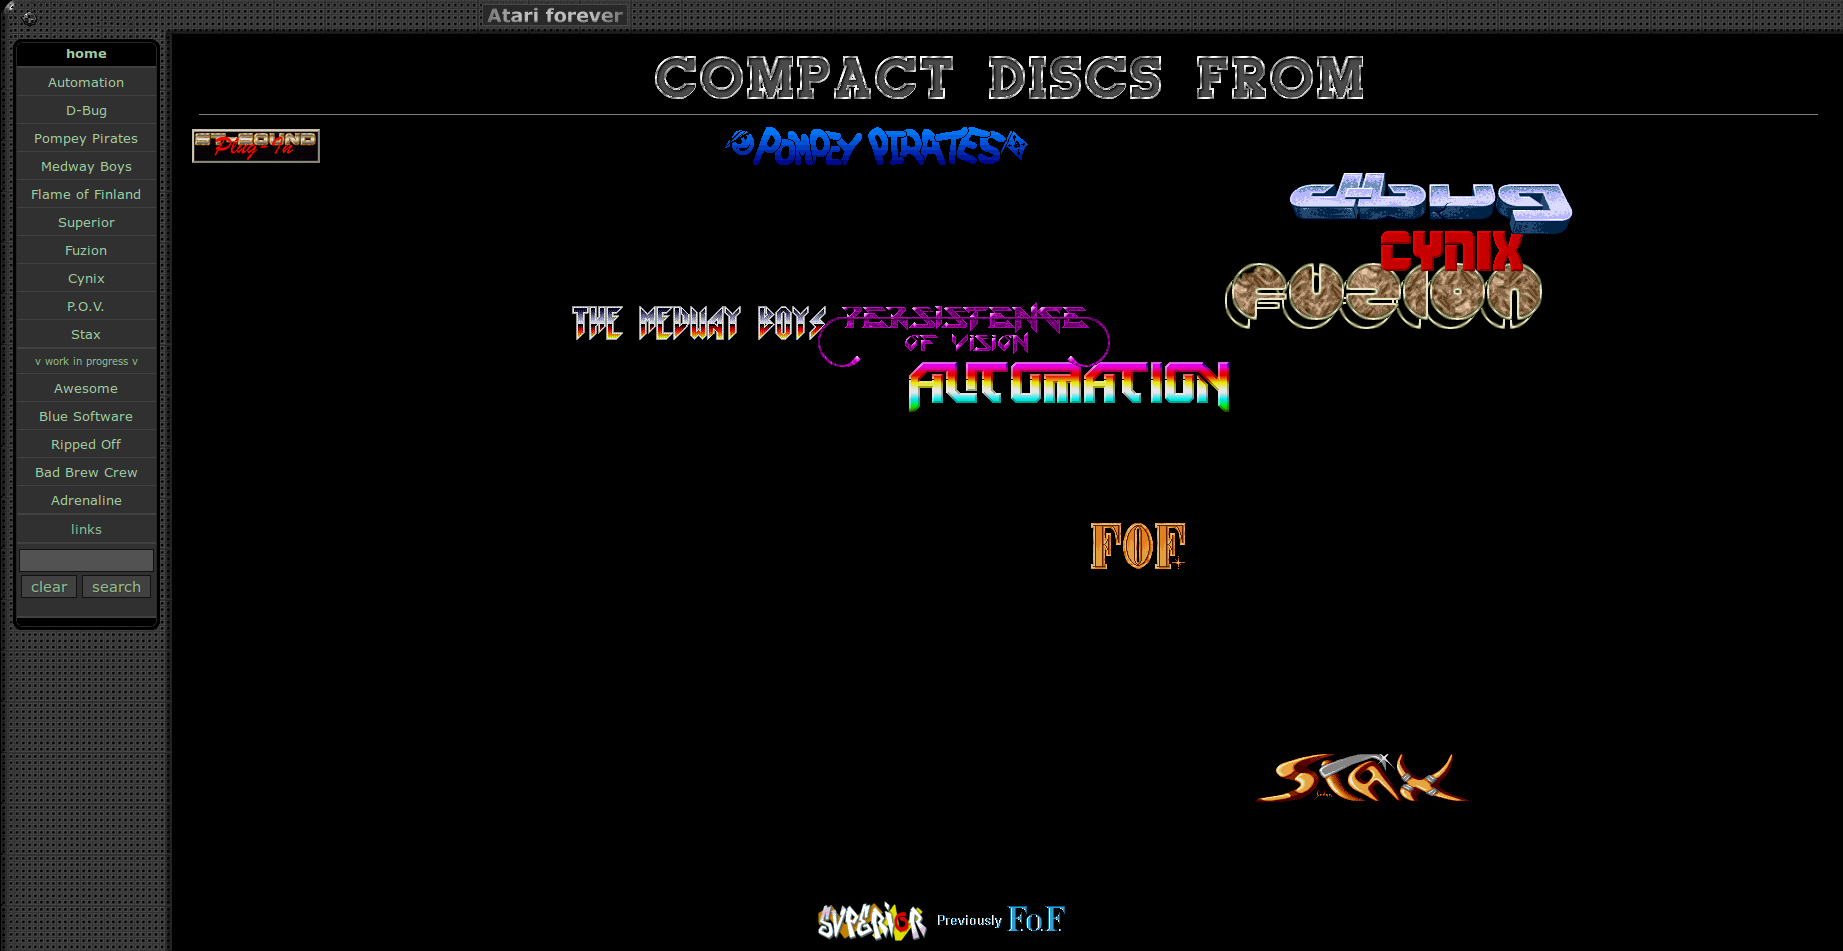 Screenshot of website Mr. Sam's Atari ST site